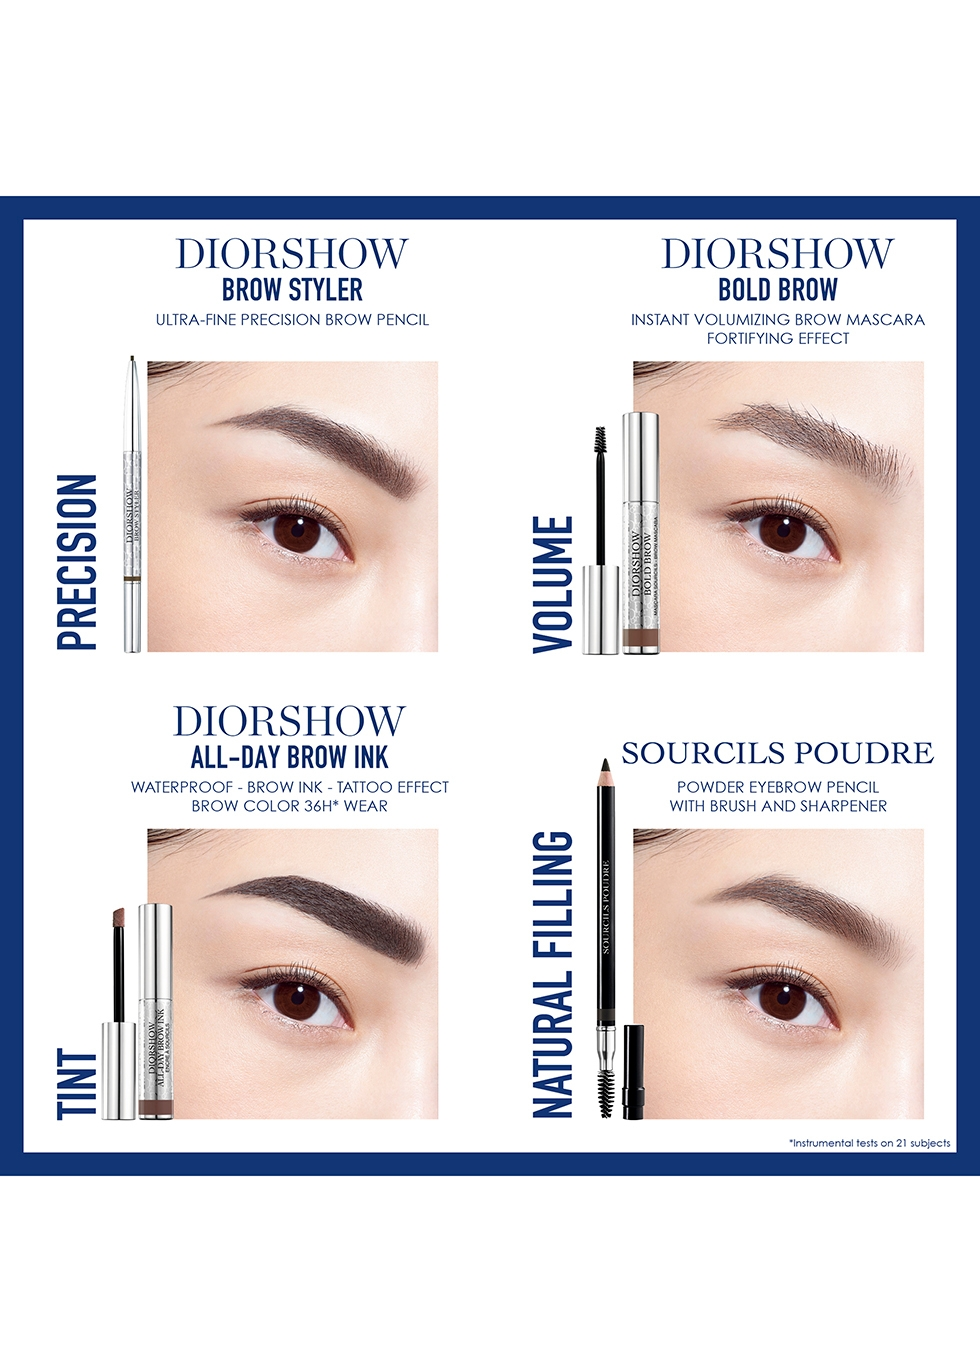 Diorshow Brow Styler - Dior